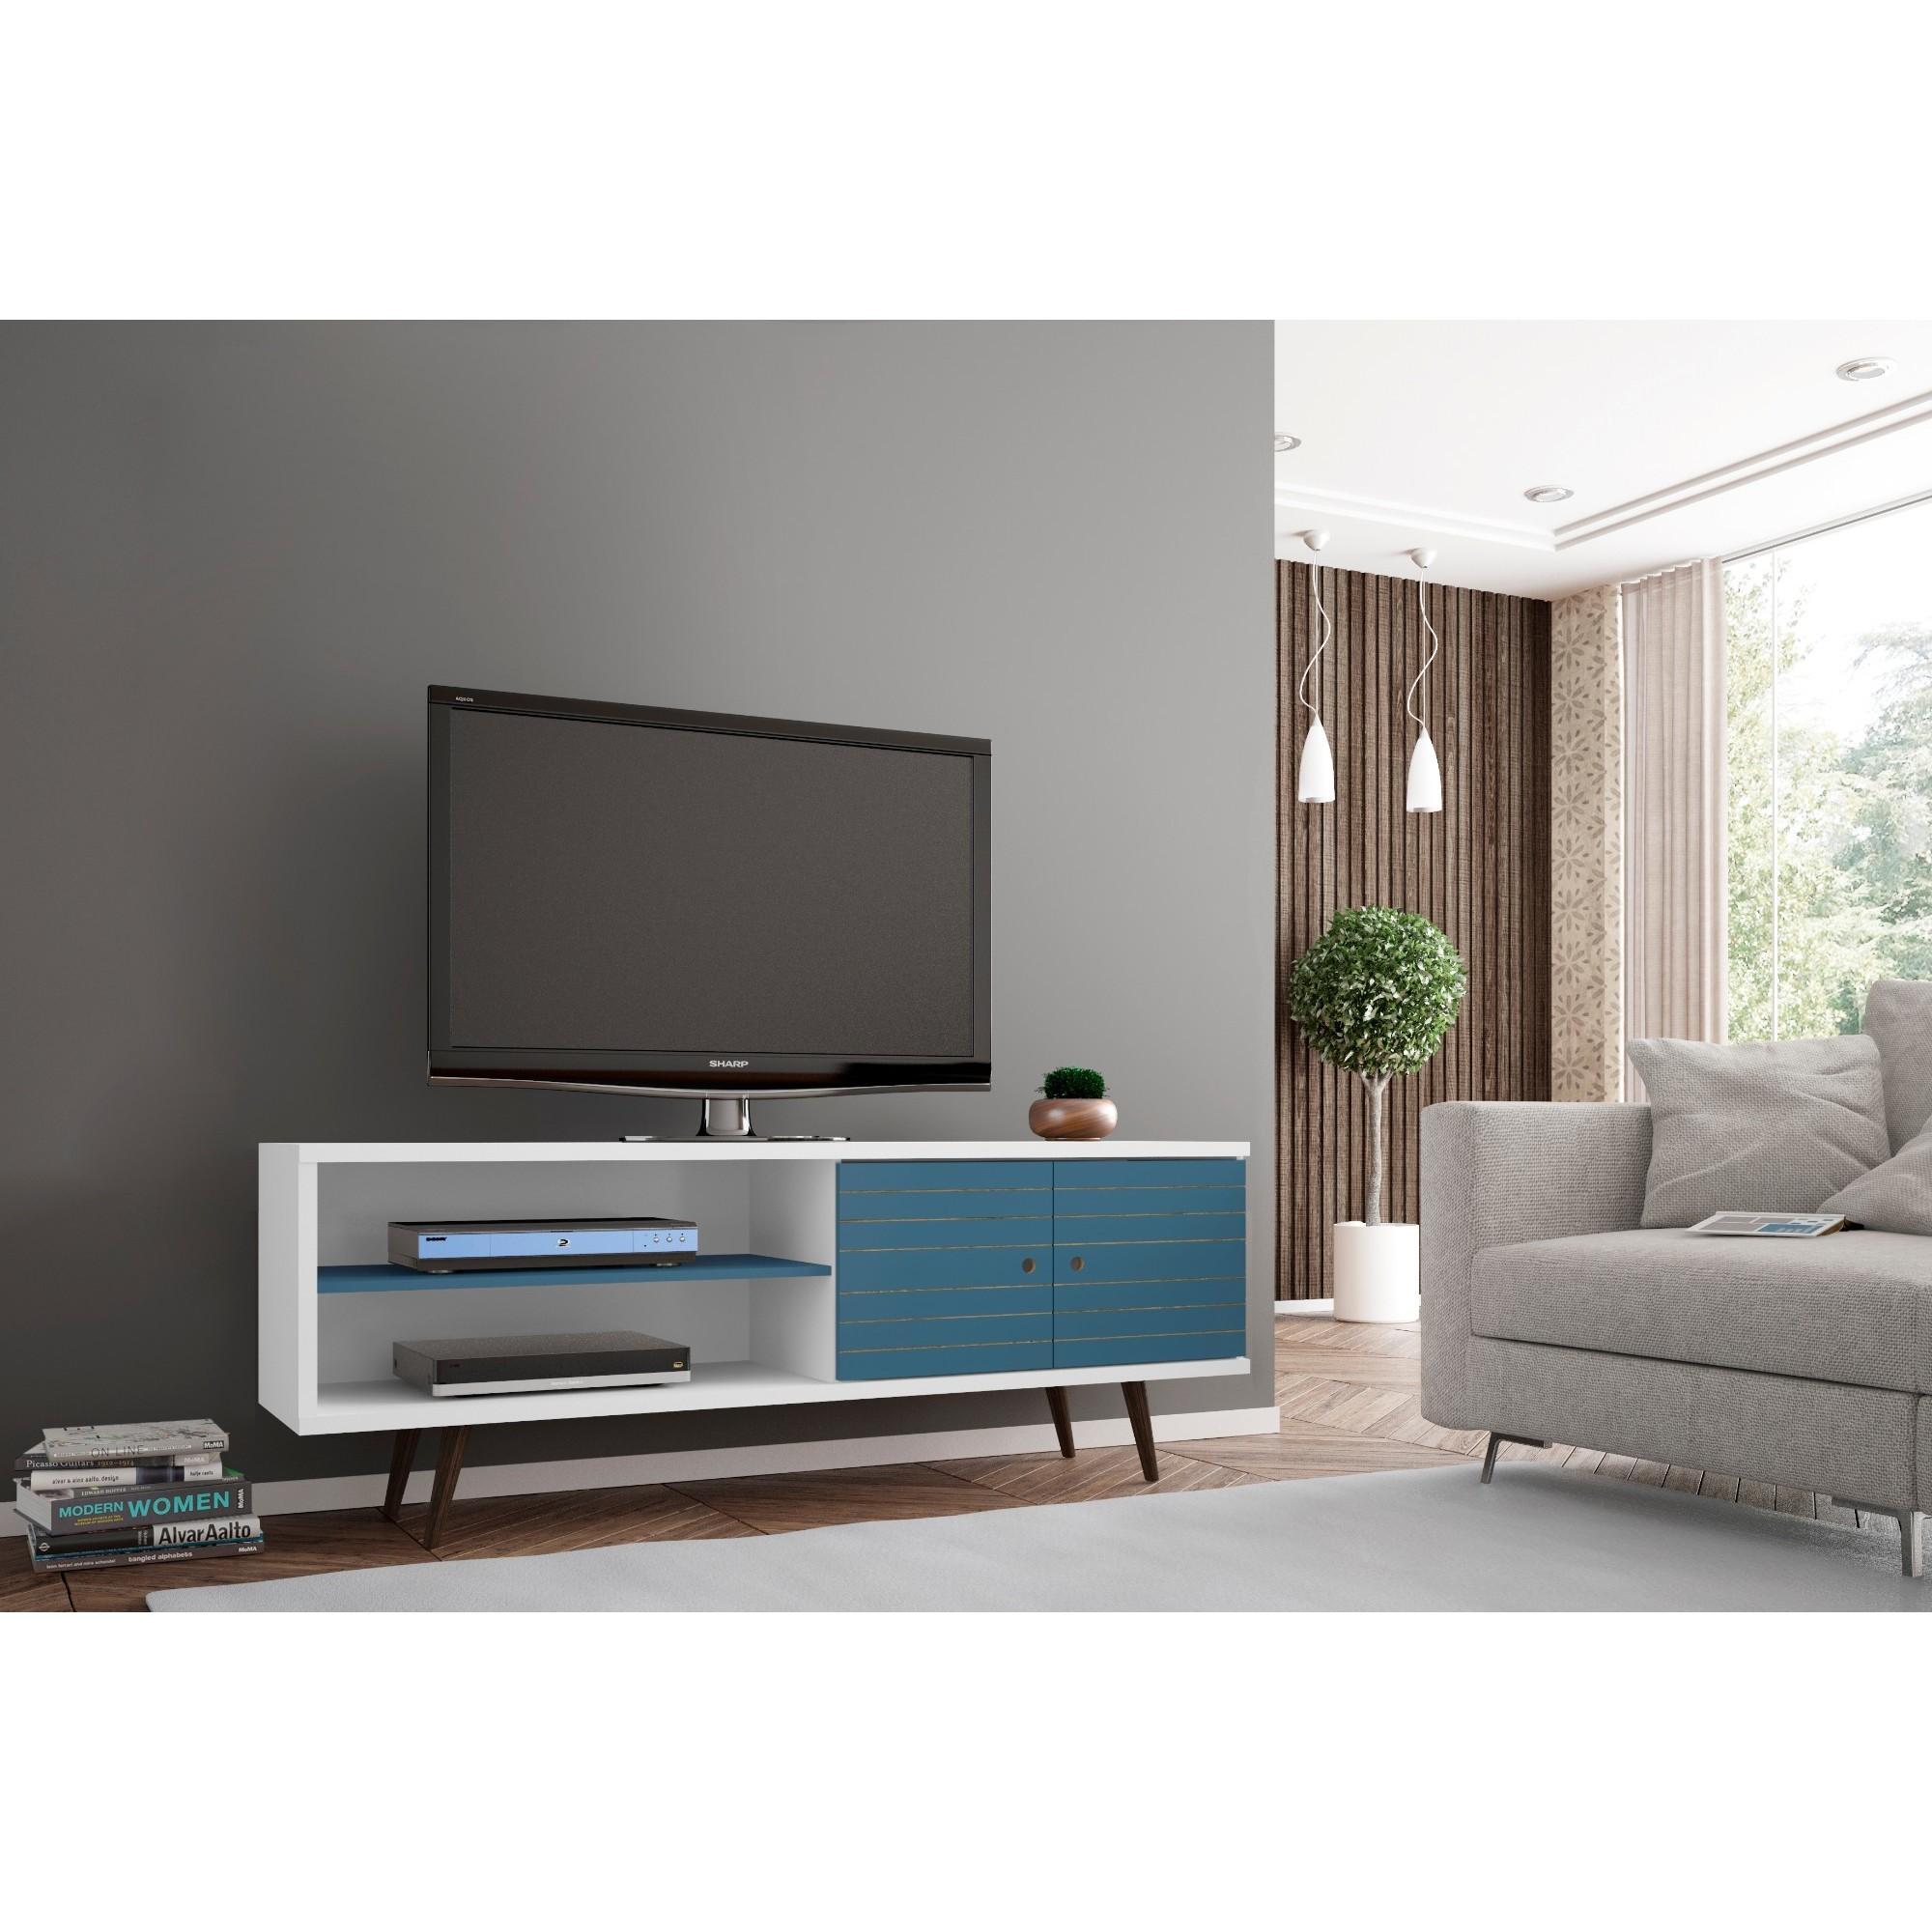 sale retailer 730b4 a4c0b Carson Carrington Sortland Wooden Modern TV Stand